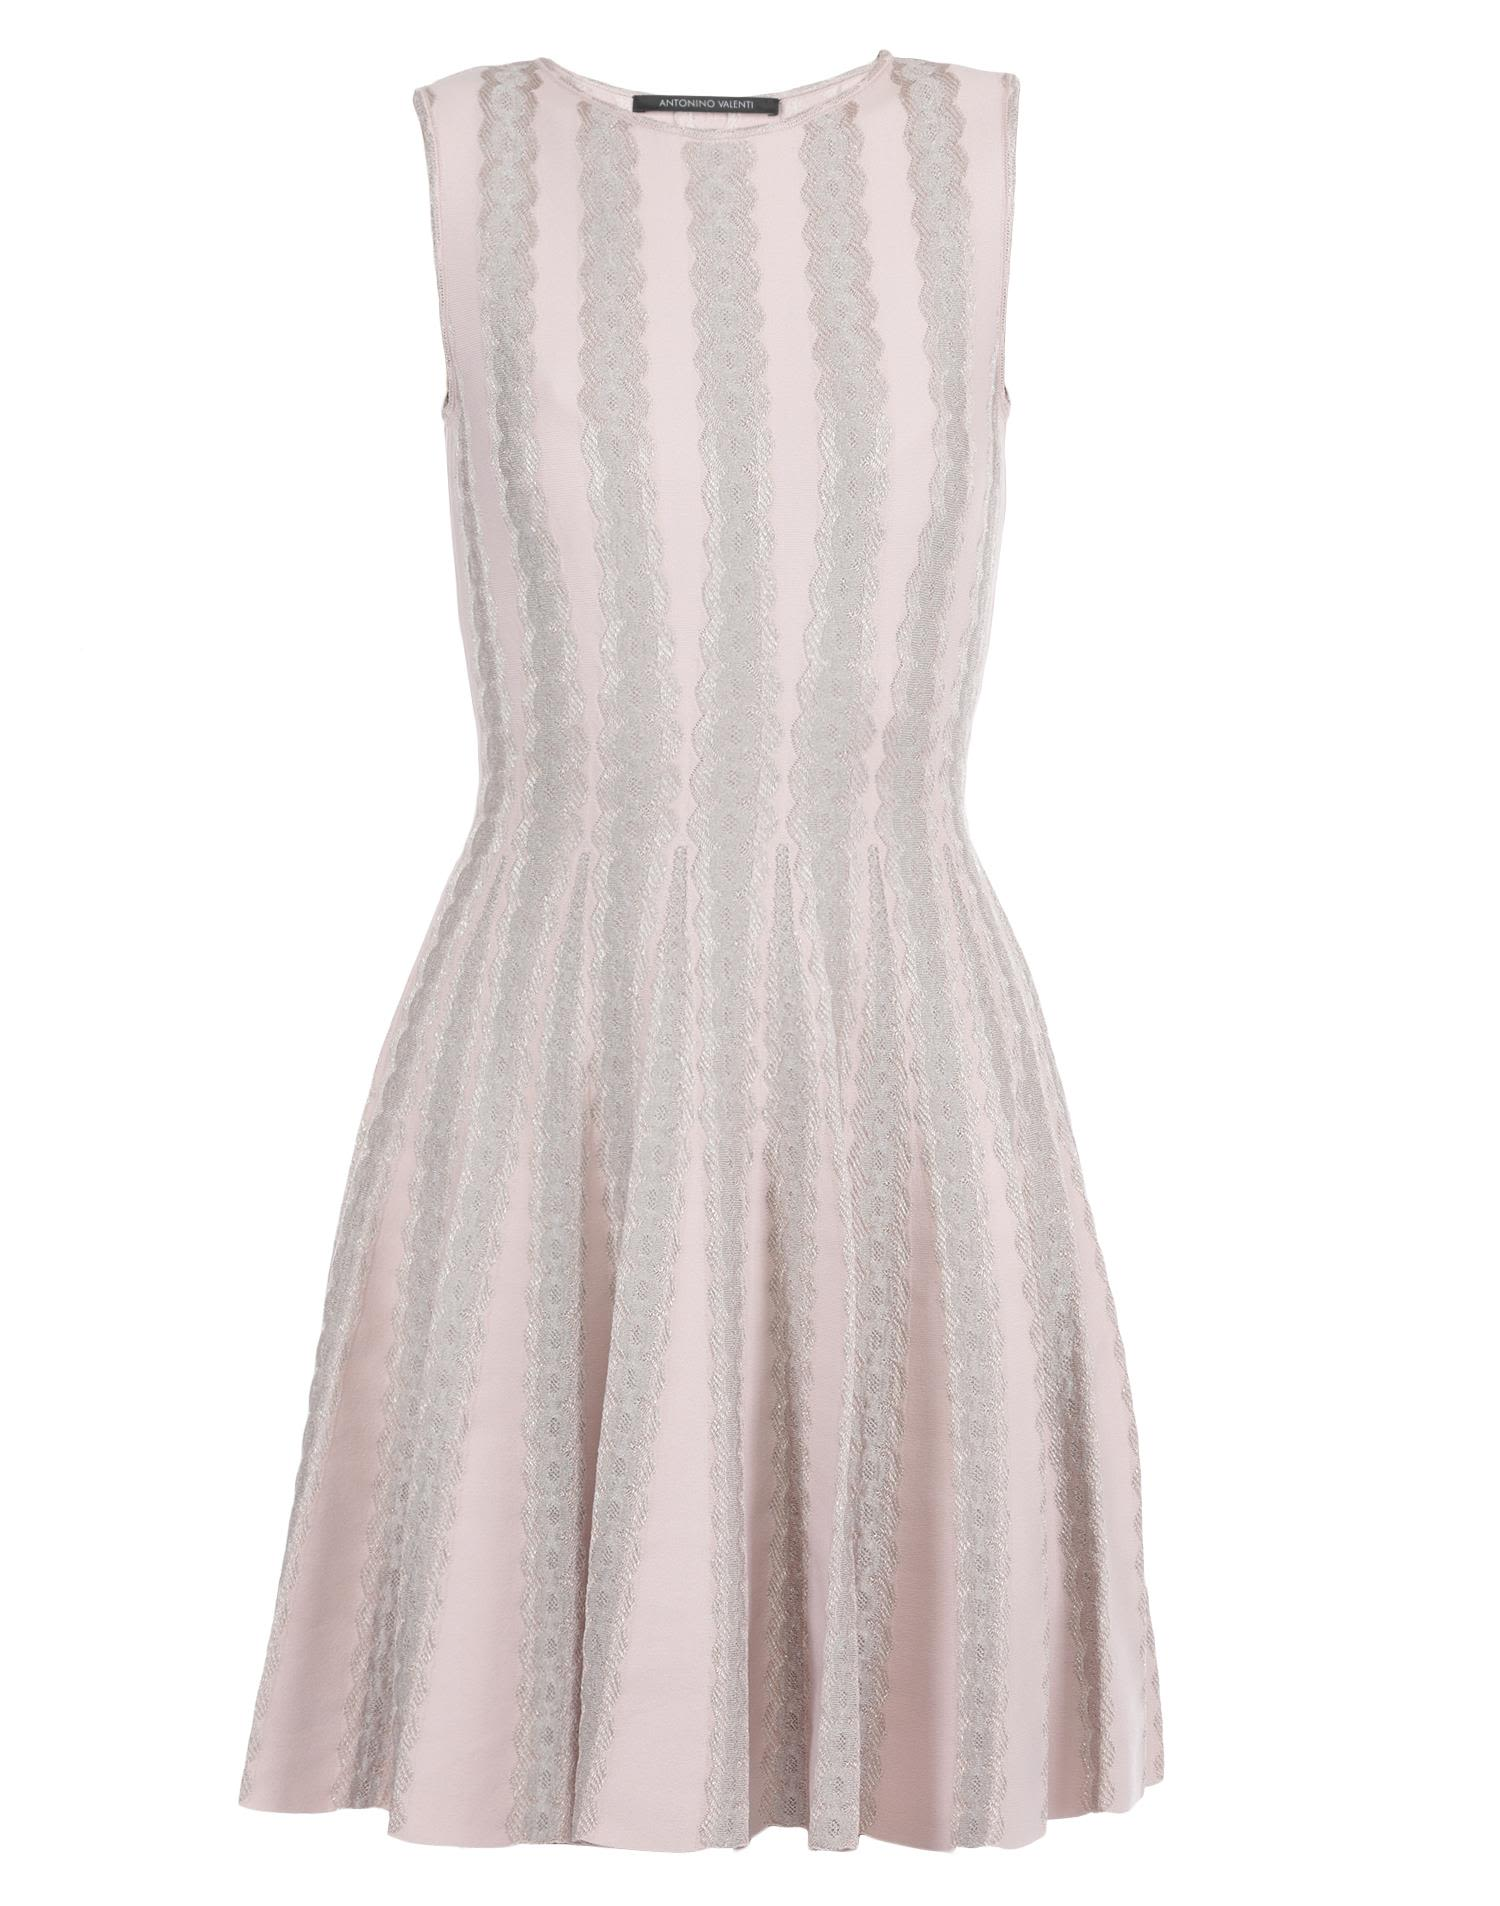 Antonino Valenti Embroidered Dress